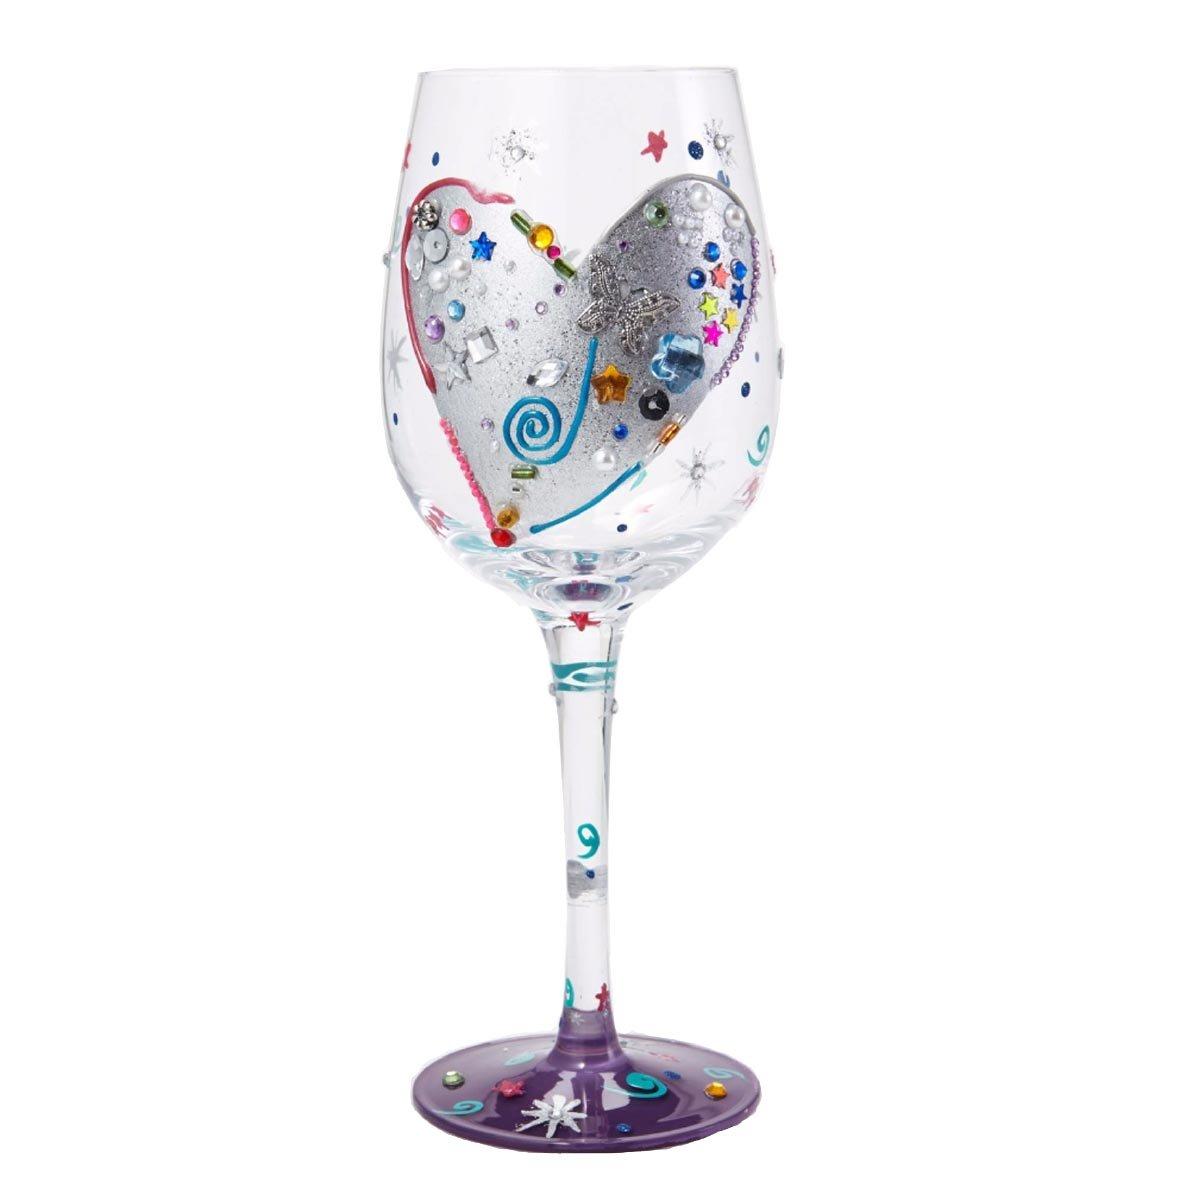 diy glasses decor centerpiece decorative centerpieces interesting wine glass